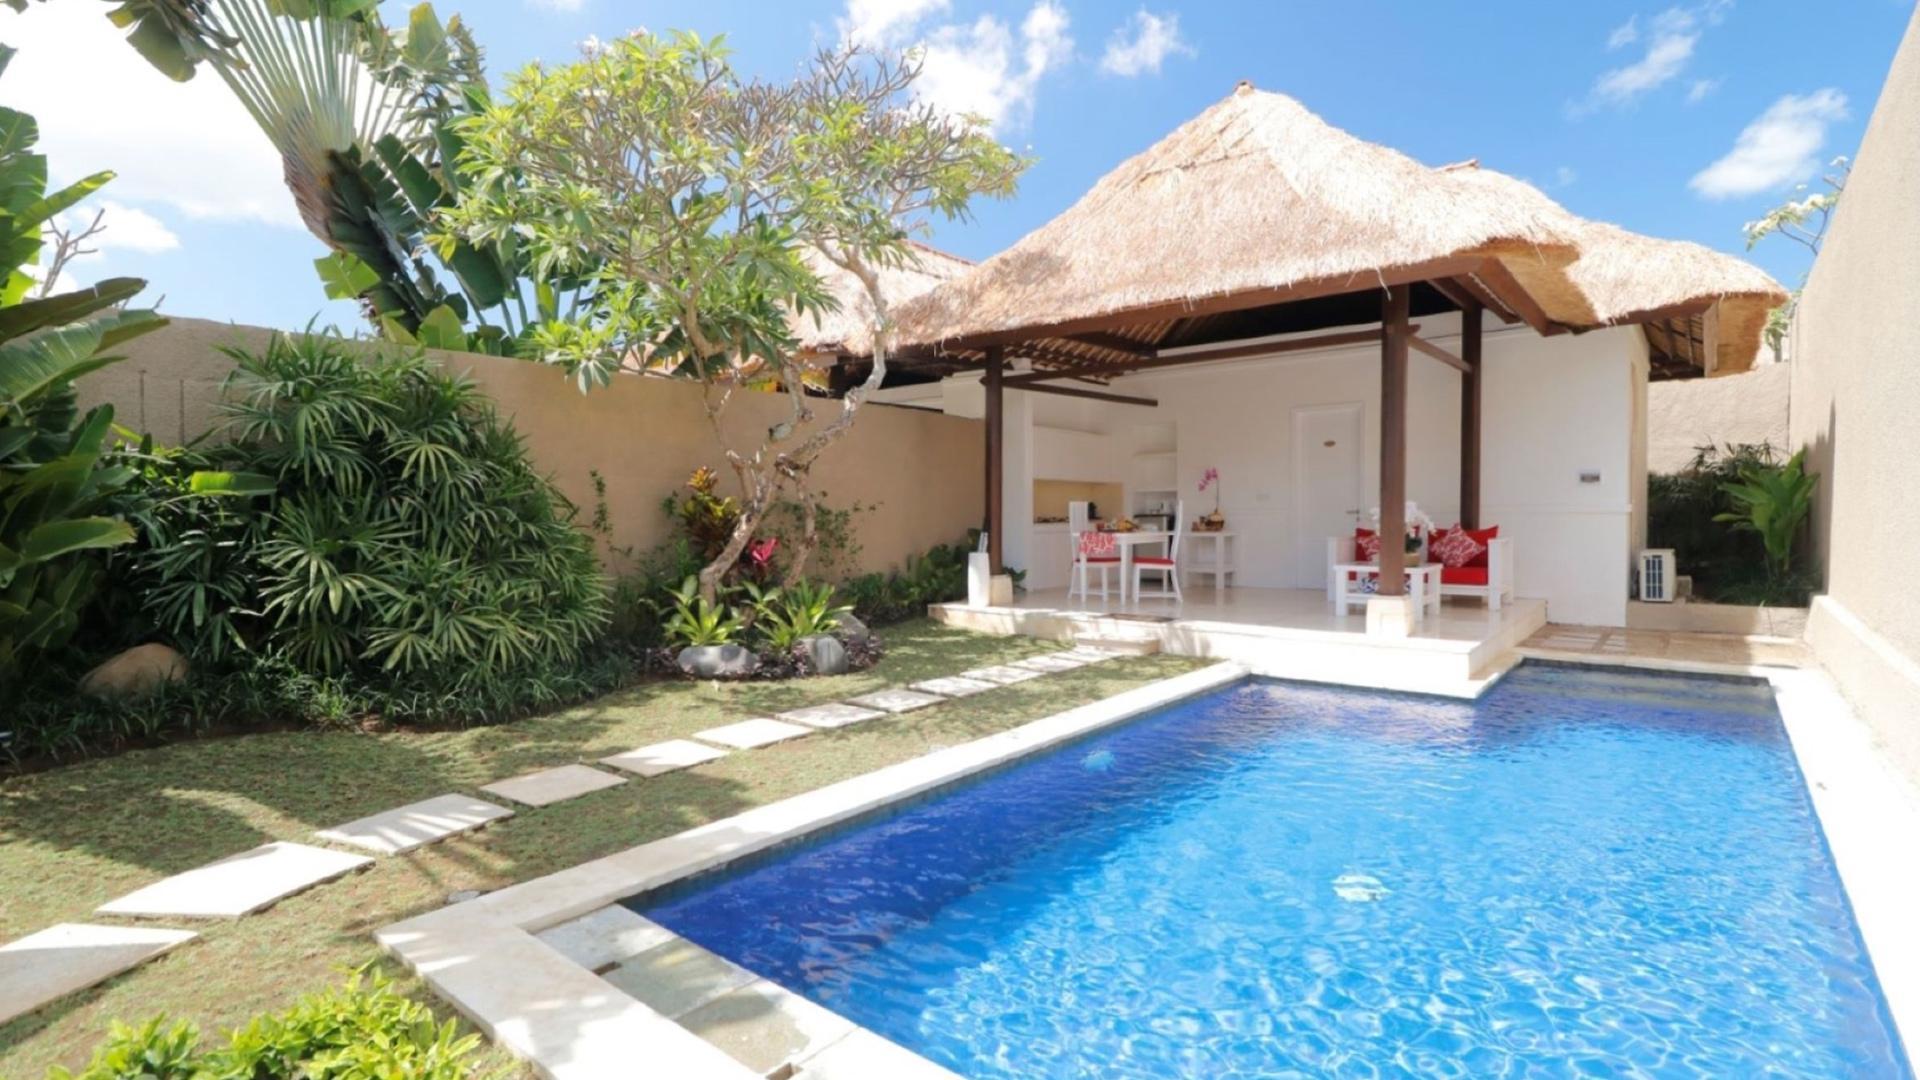 One-Bedroom Pool Villa image 1 at Alam Boutique Resort by Kabupaten Badung, Bali, Indonesia